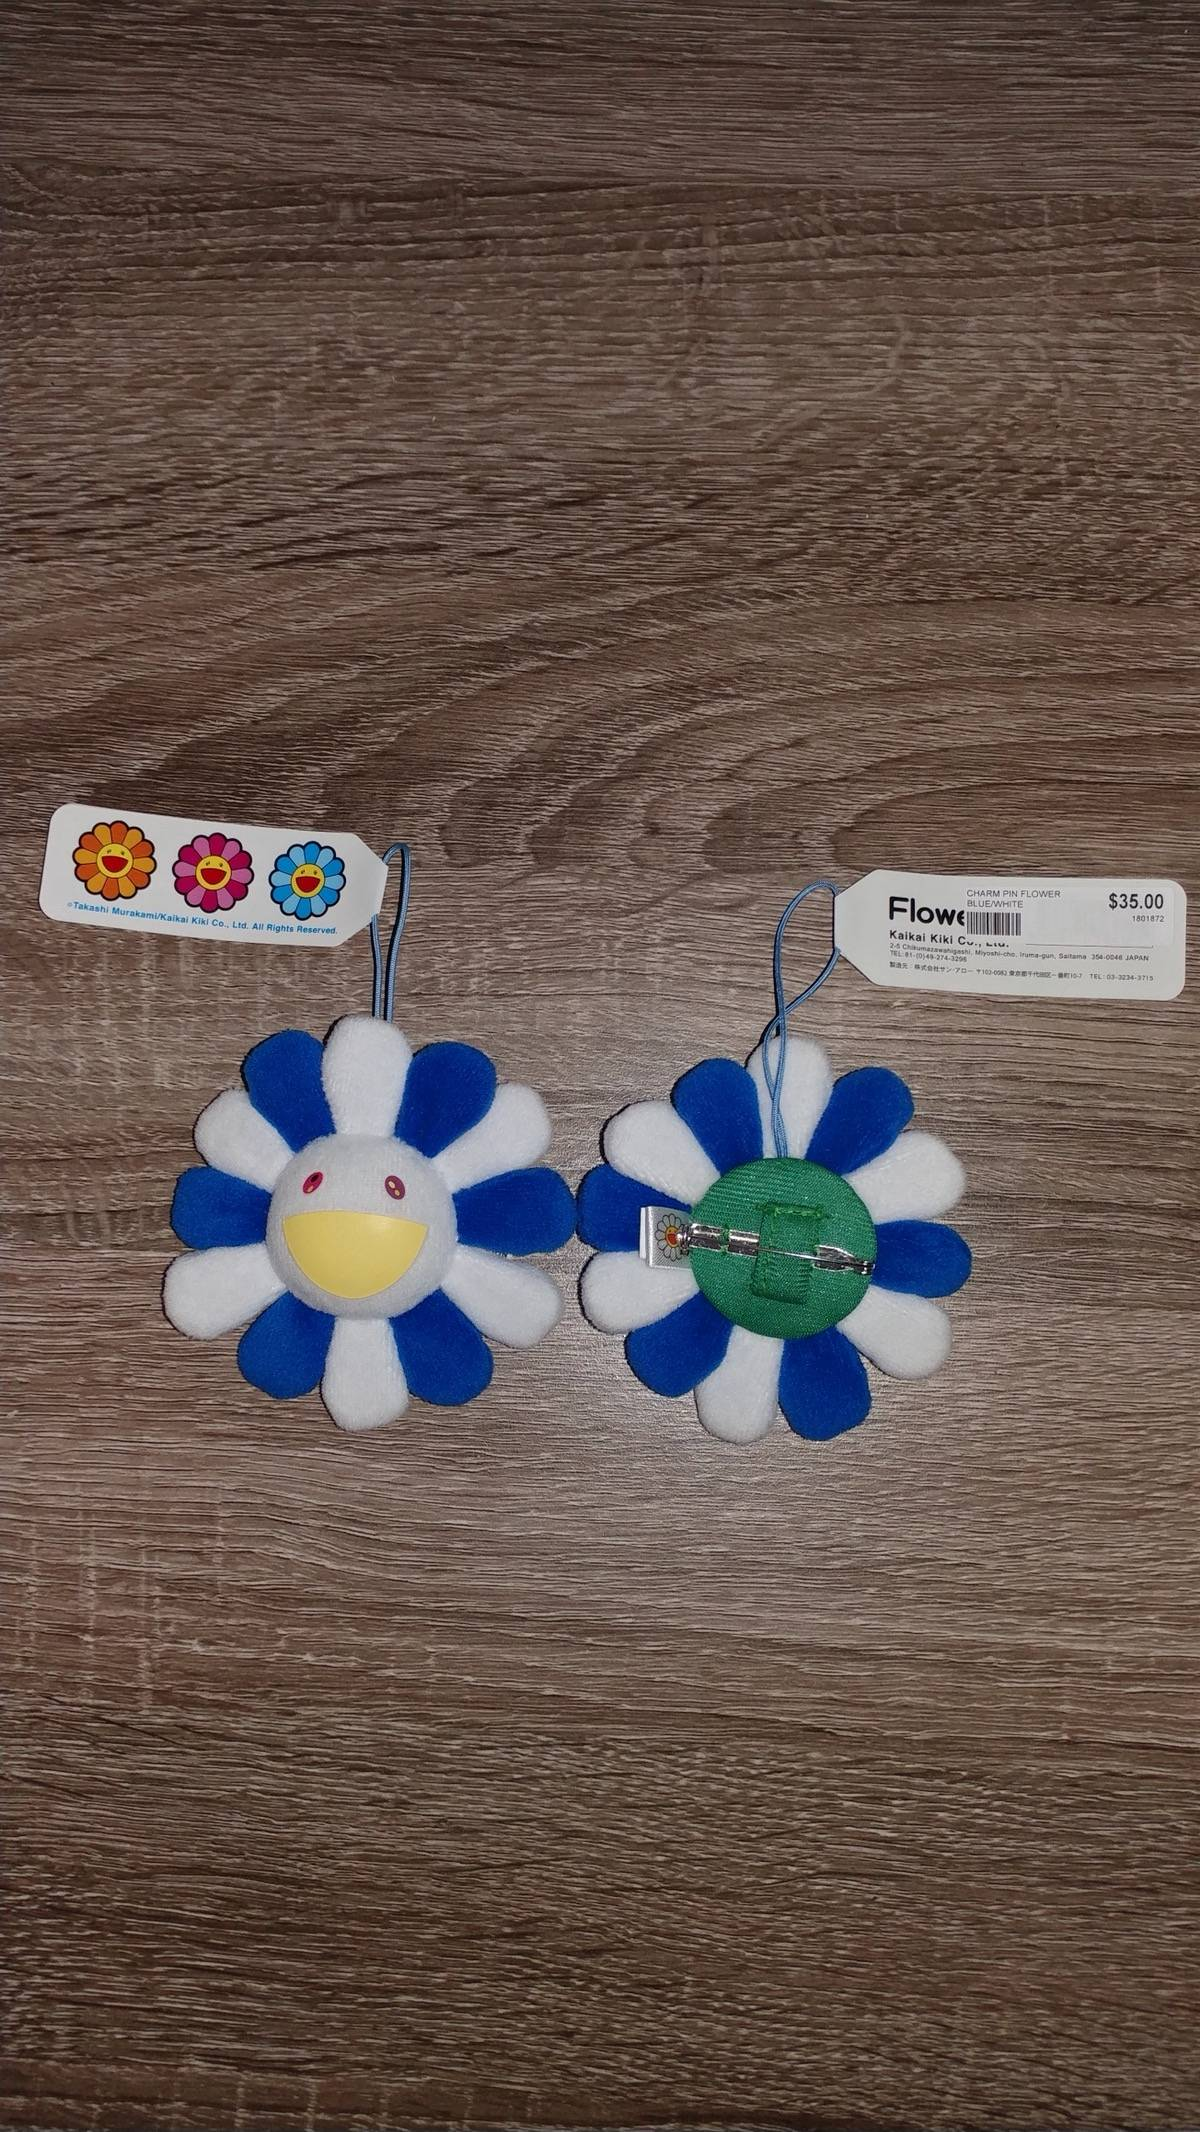 fad8164f57b3 Takashi Murakami Flower Charm Pin  final Drop